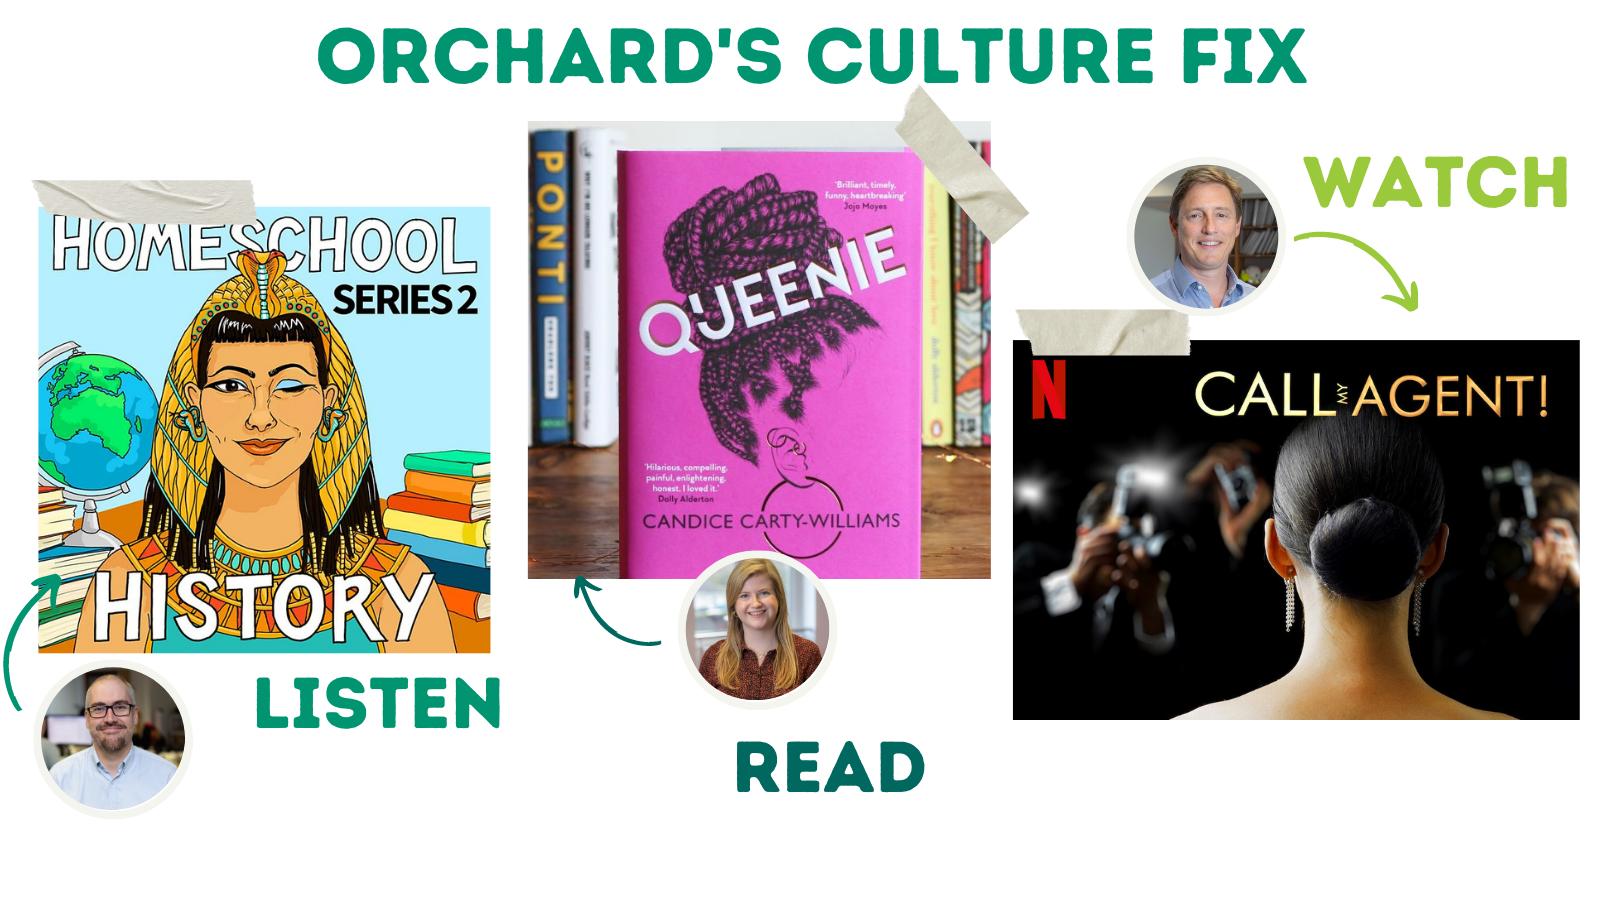 Orchard's culture fix #3